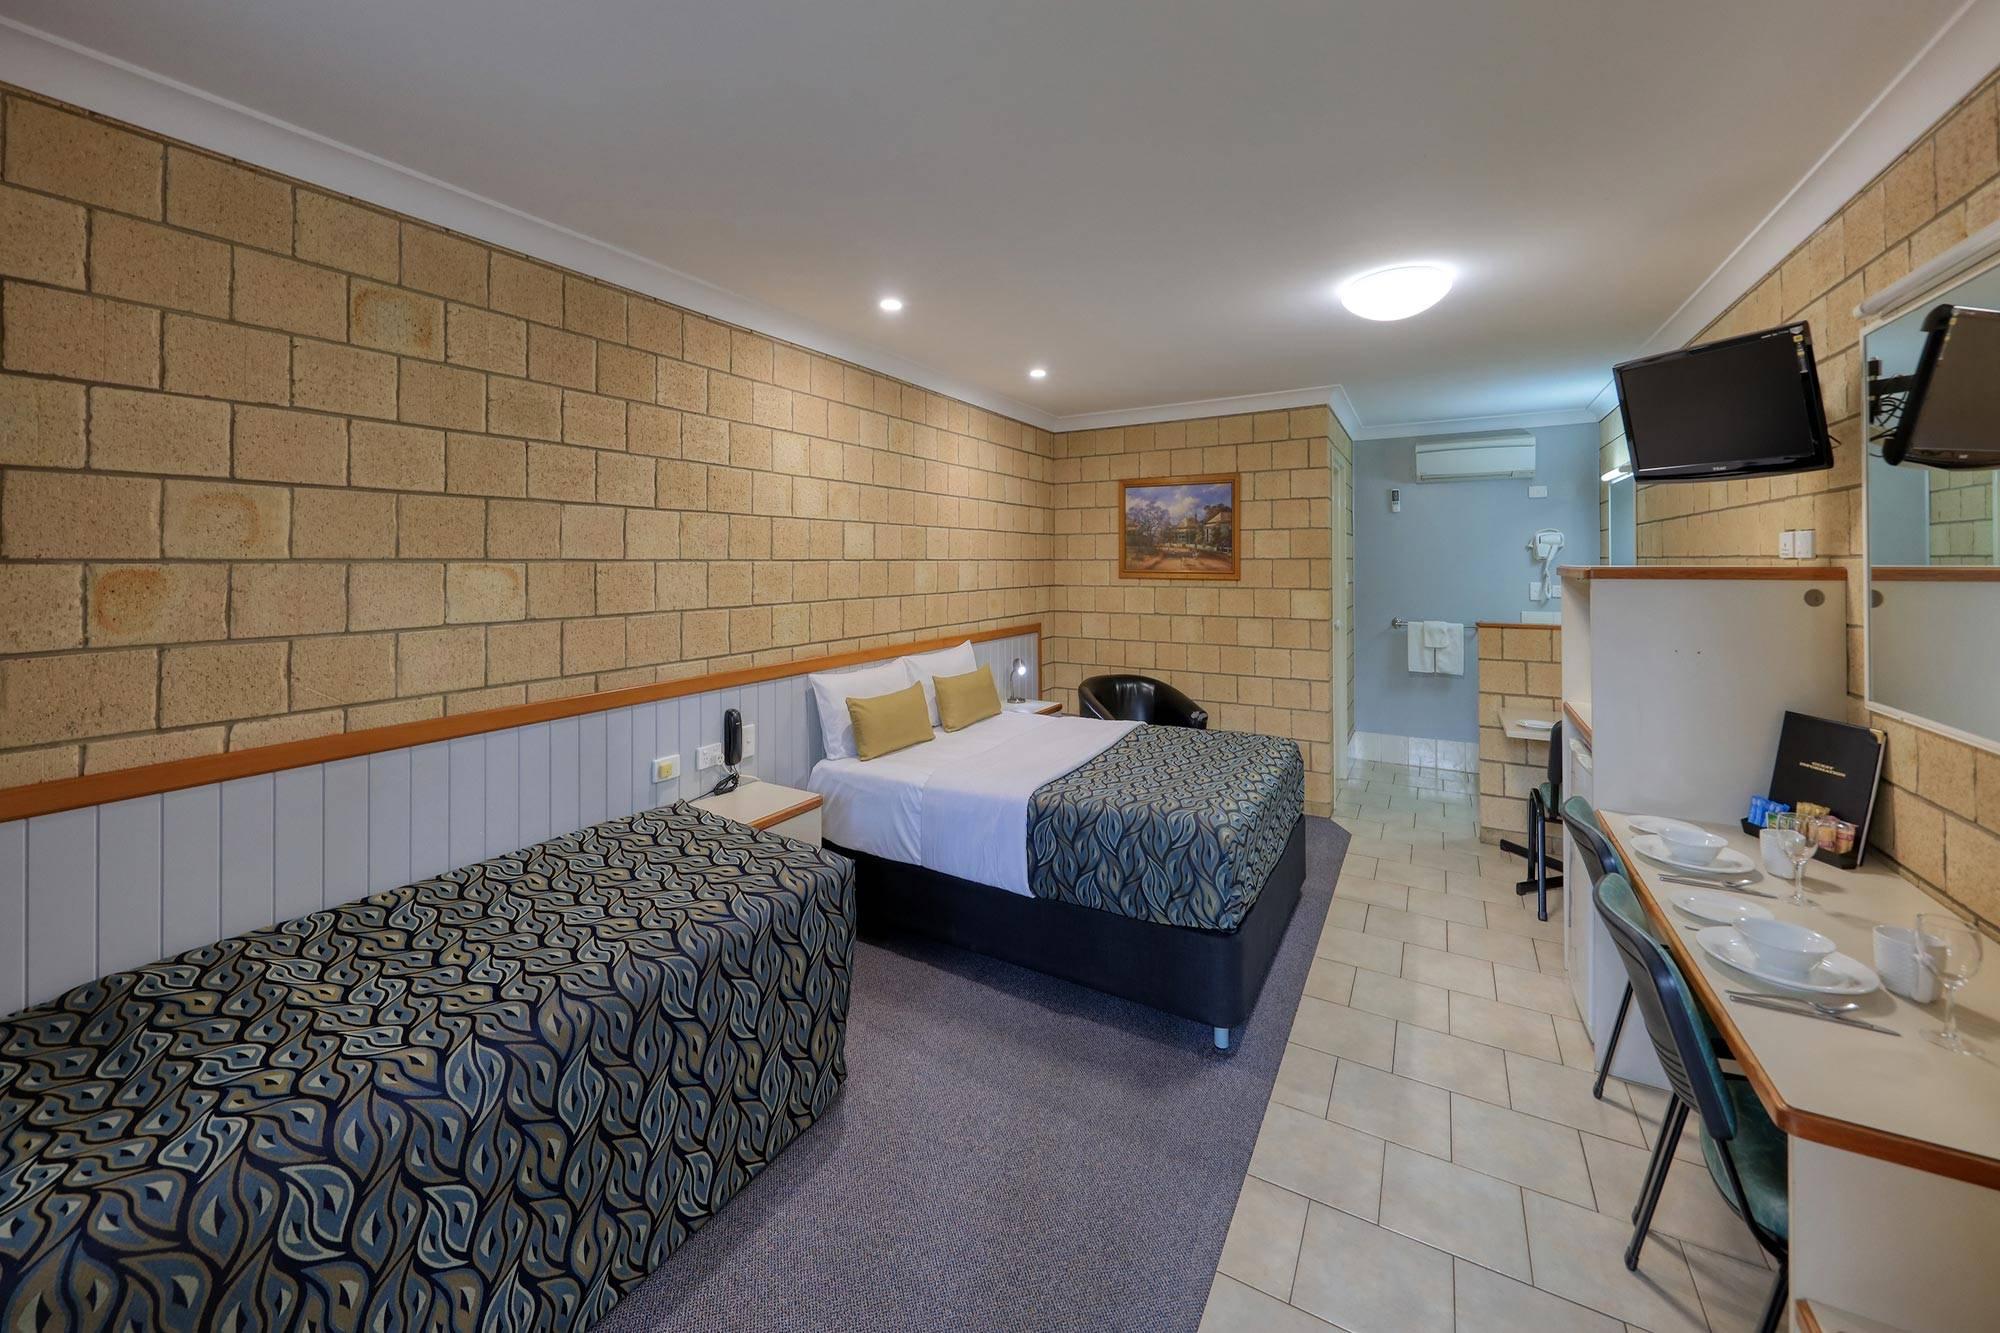 st-george-motel-family-room-(1)